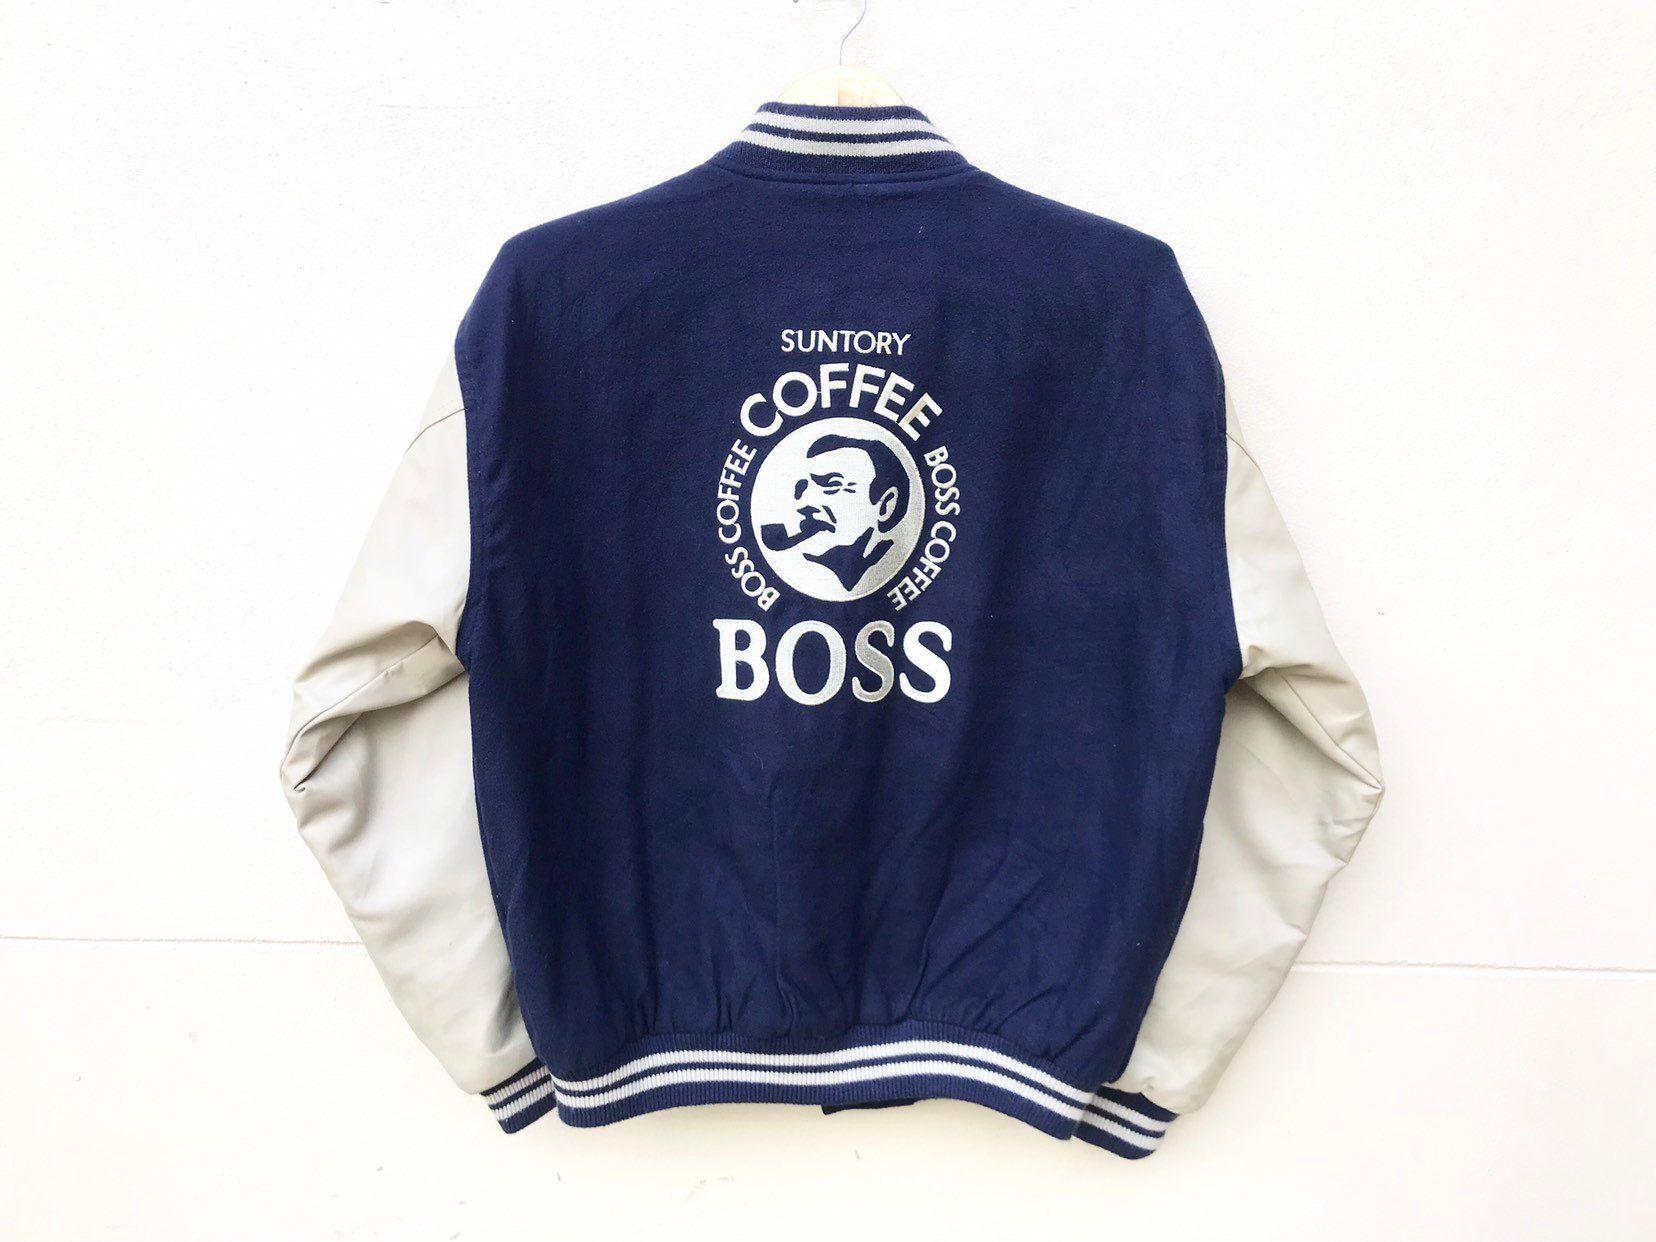 6ce9bc375 Vintage Suntory Boss Coffee varsity jacket, Big logo band (size M-L ...